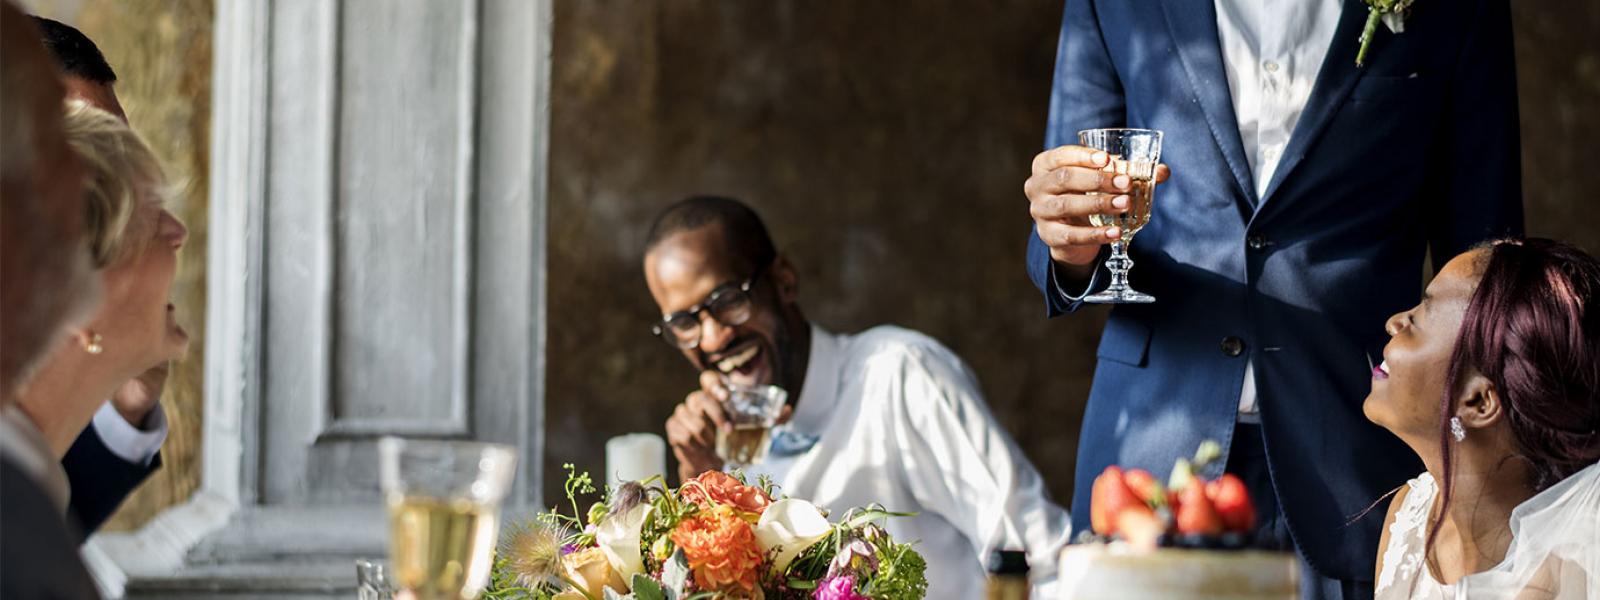 Delivering a confident wedding speech - a wedding breakfast